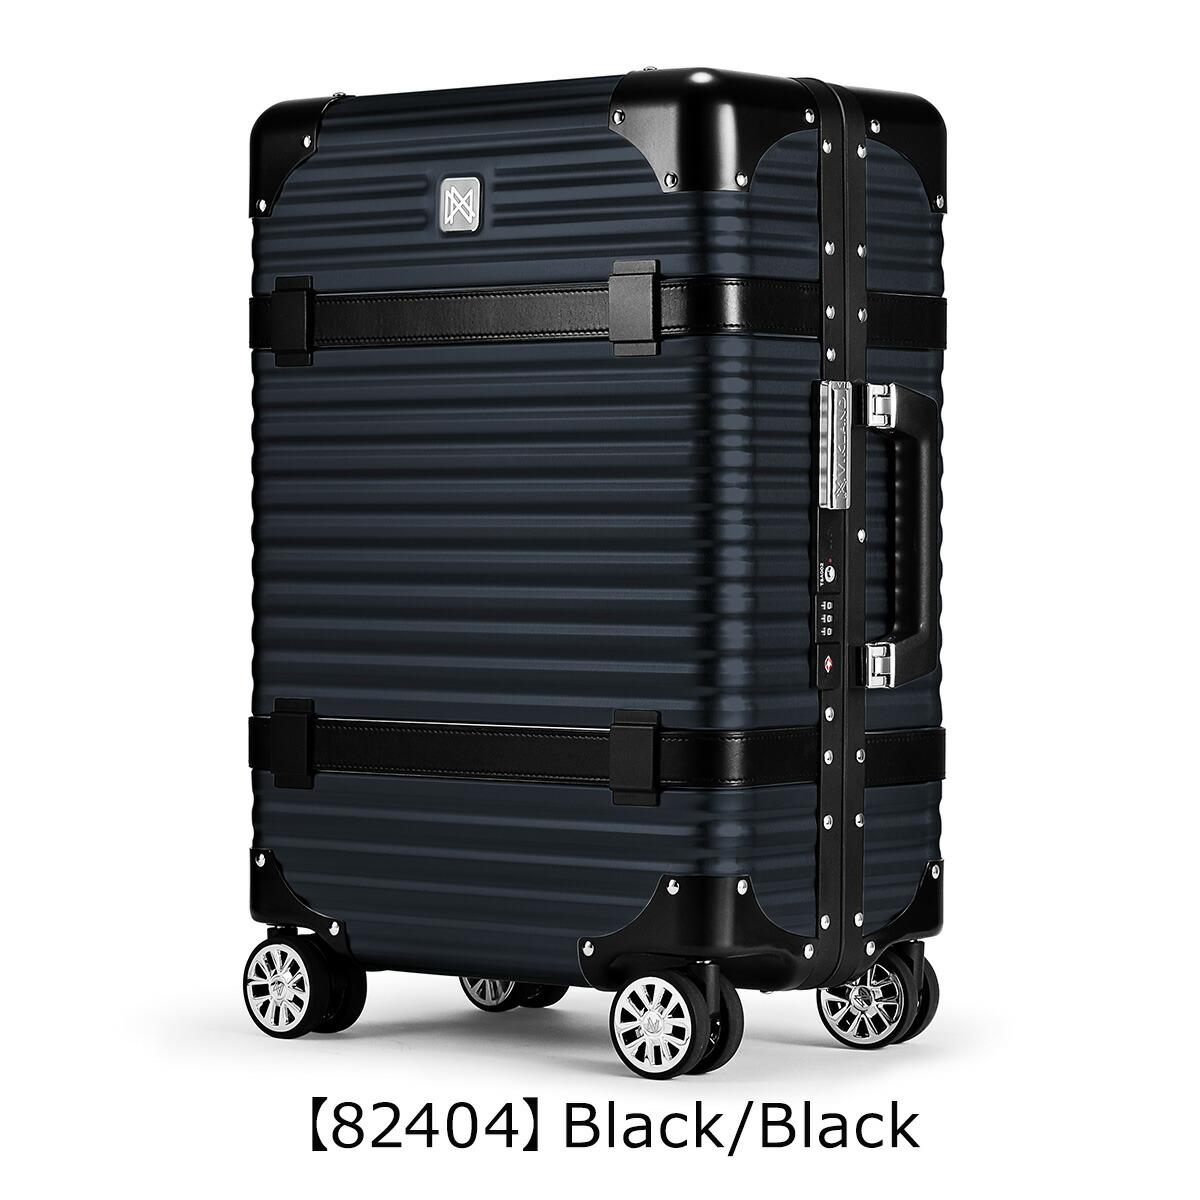 【82104】Black/Black